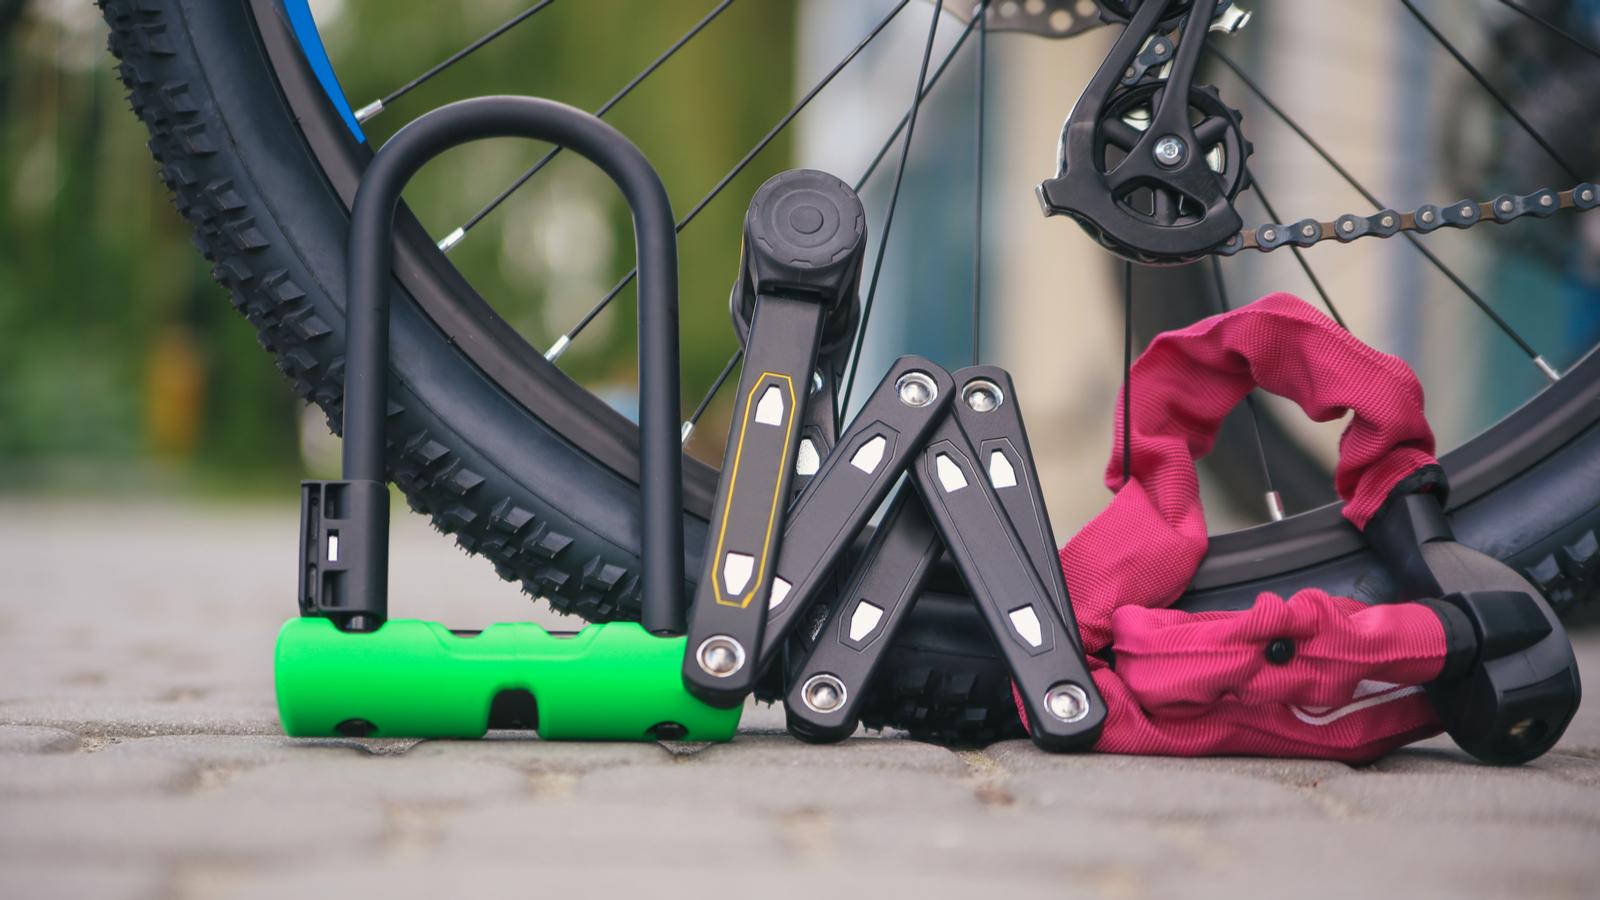 Bike locks on the ground next to a bike wheel.